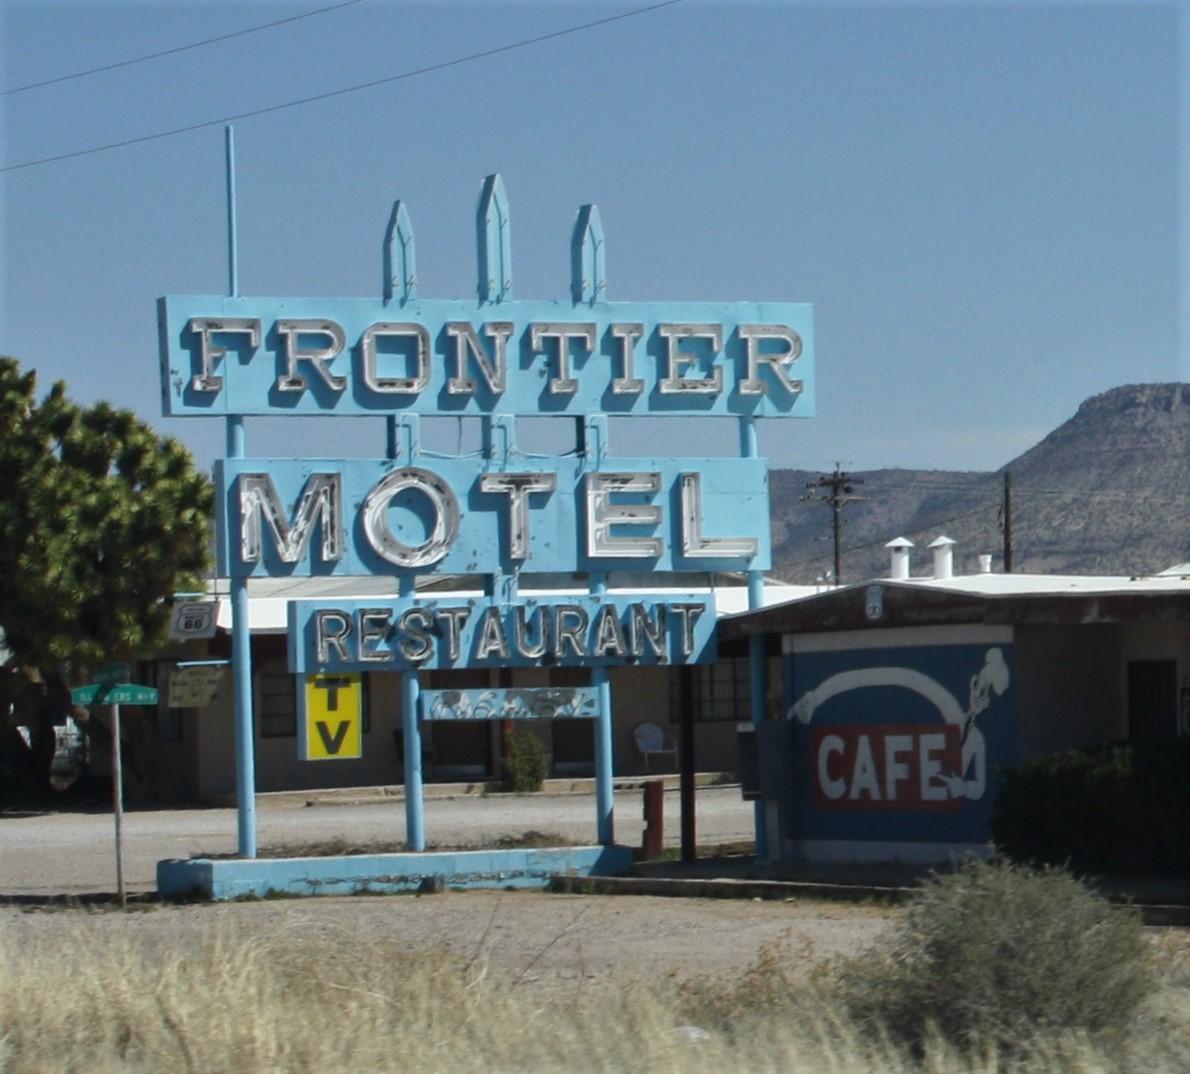 2012 03 14 Route 66 Road Trip 167 Peach Springs Arizona.JPG